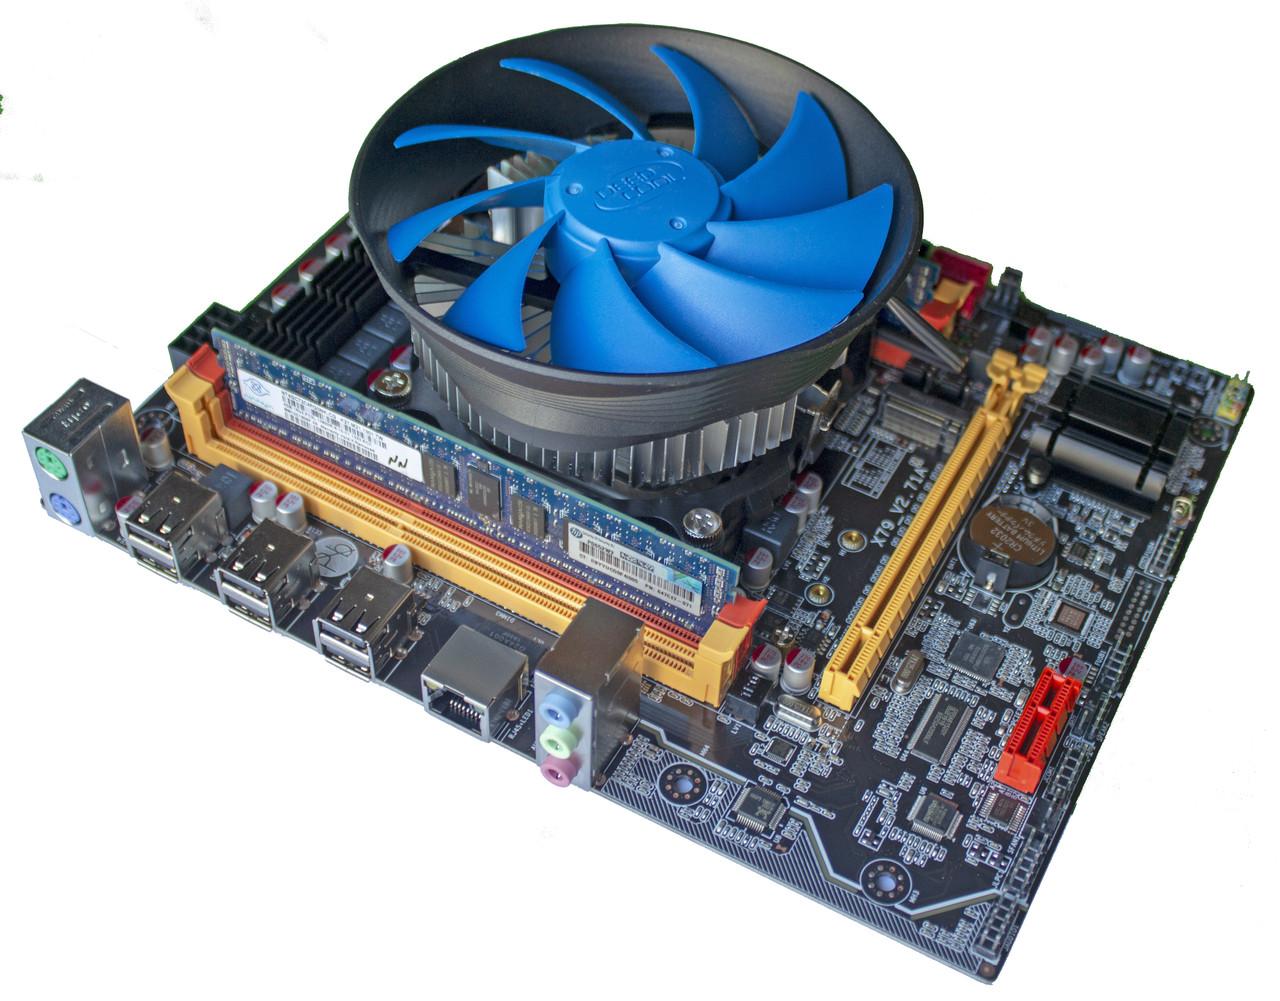 Комплект X79-2.72 + Xeon E5-2643 + 16 GB RAM + Кулер, LGA 2011